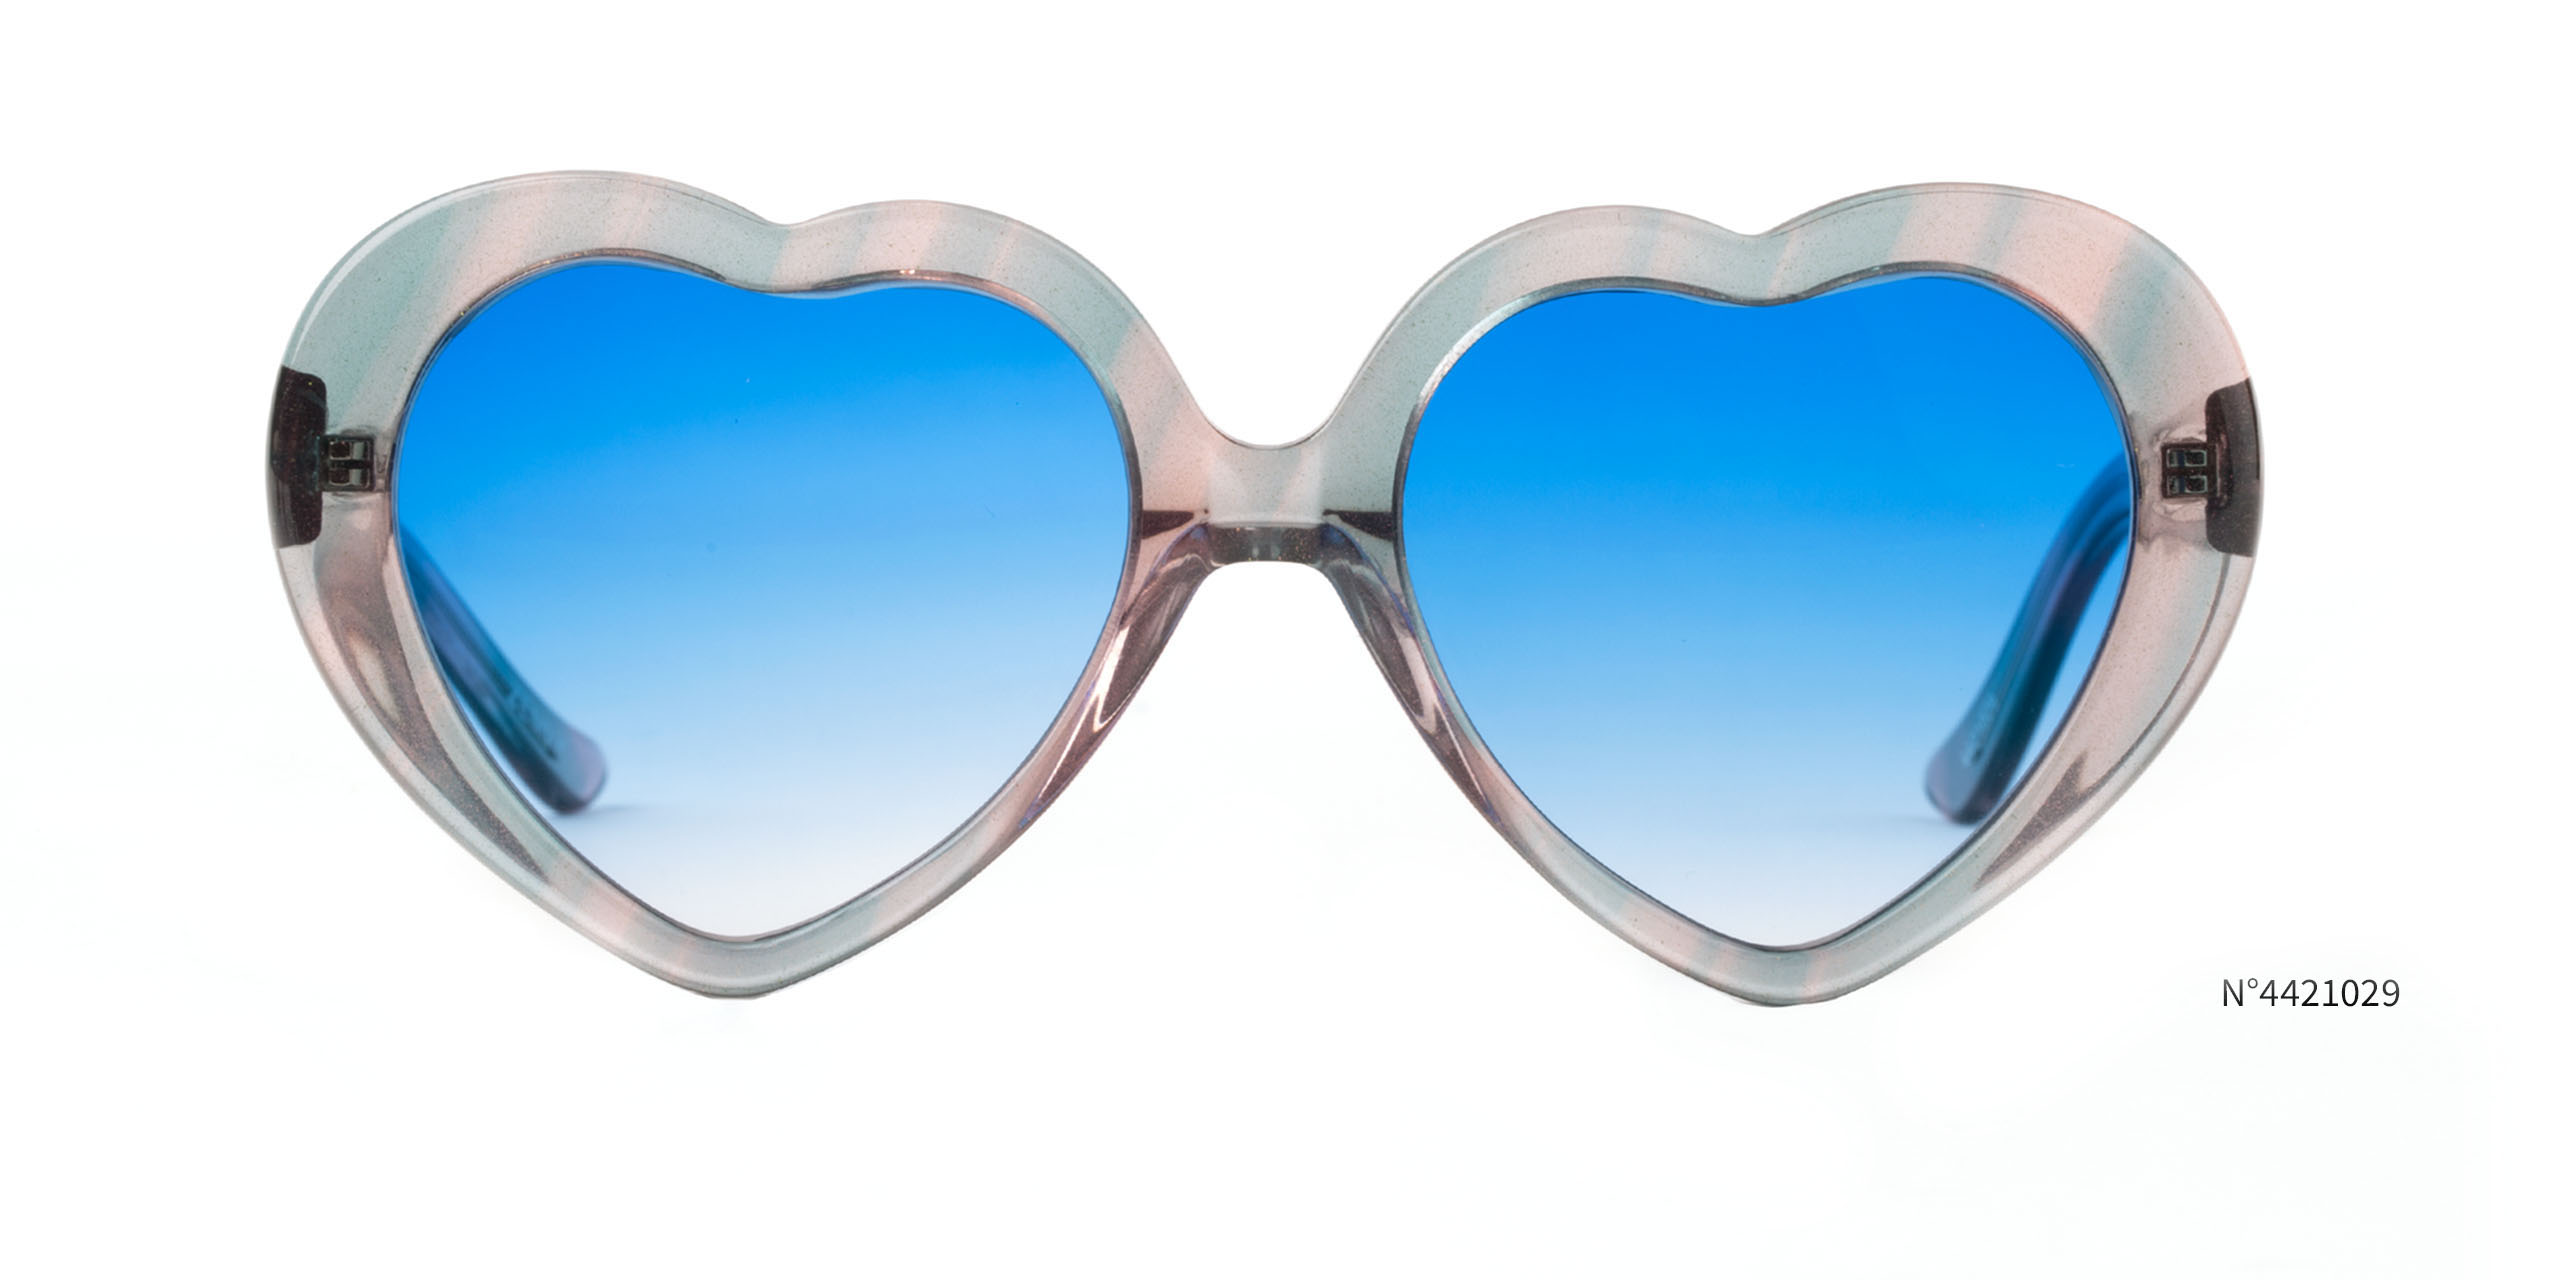 heart shaped edm glasses